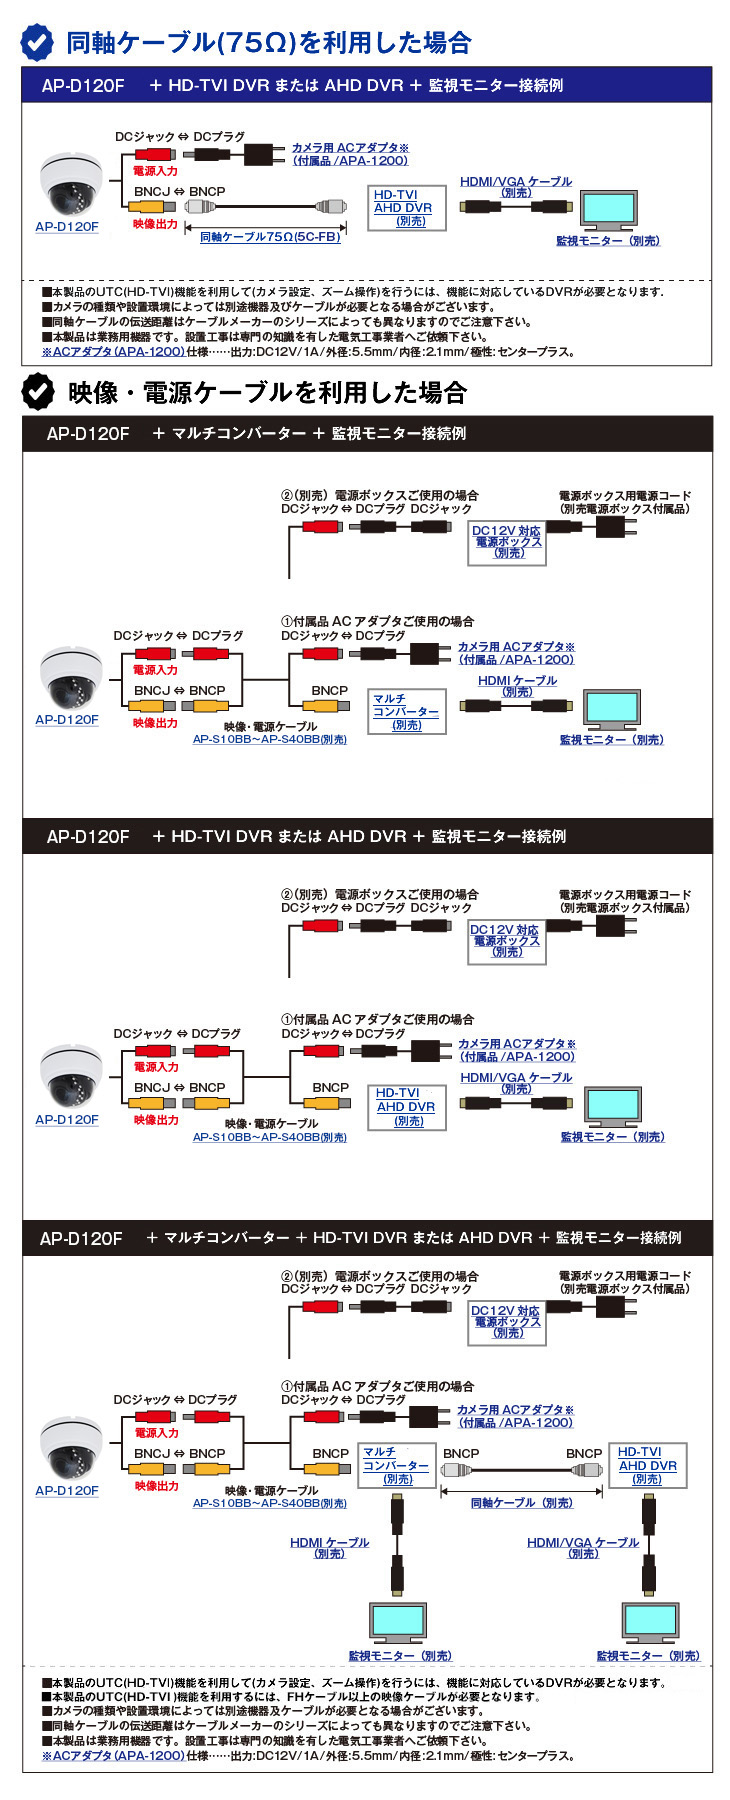 AHD 200万画素防犯カメラ(AP-D120F)